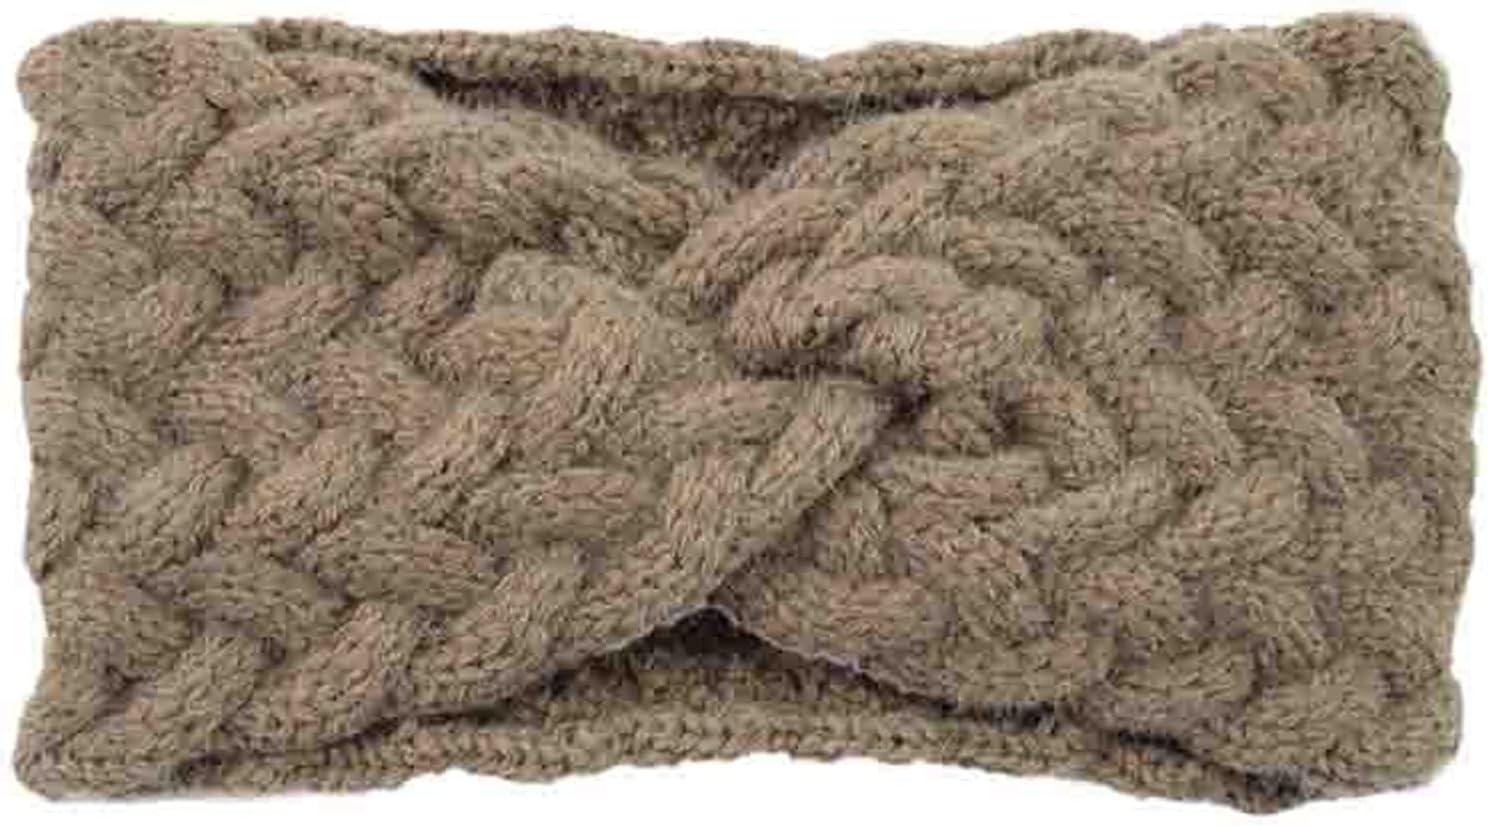 YUXINYAN Headbands 2 Pieces, Women's Wool Knitted Headband, Autumn and Winter Plush Ear Warmer, Knitted Scarf, Knitted Headband, Hair Accessories Head Scarfs (Color : F)